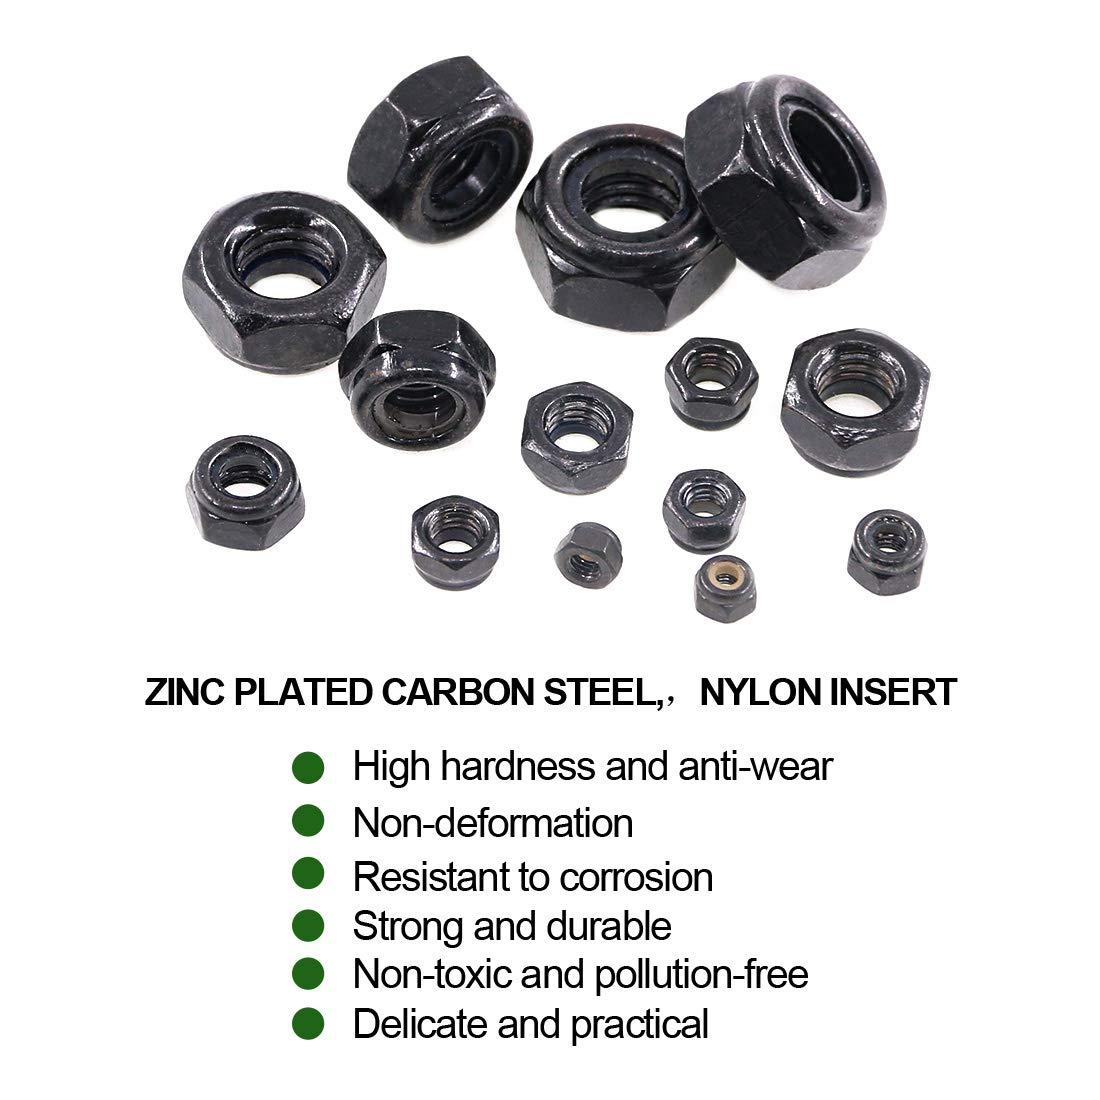 Keadic 185 Pieces Metric Black Zinc Plated Nylon Insert Lock Nuts Assortment Kit for Matching Screws or Bolts Sizes Include:M3 M4 M5 M6 M8 M10 M12